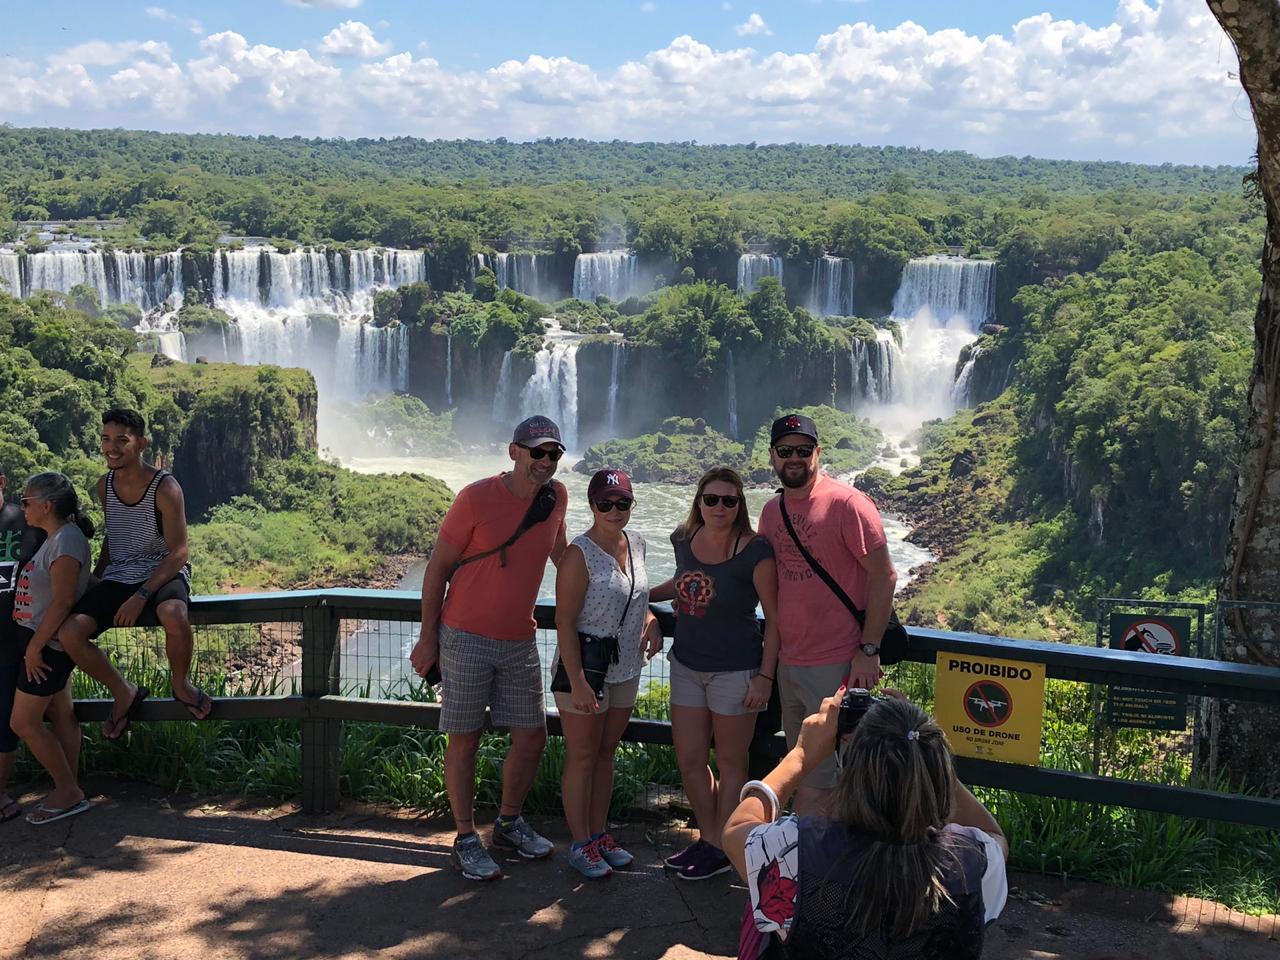 FOZ COMBO 4 - Arriving Puerto Iguazu / Staying in Foz do Iguaçu / Argentine + Brazil Side of Falls / Departing Foz do Iguaçu